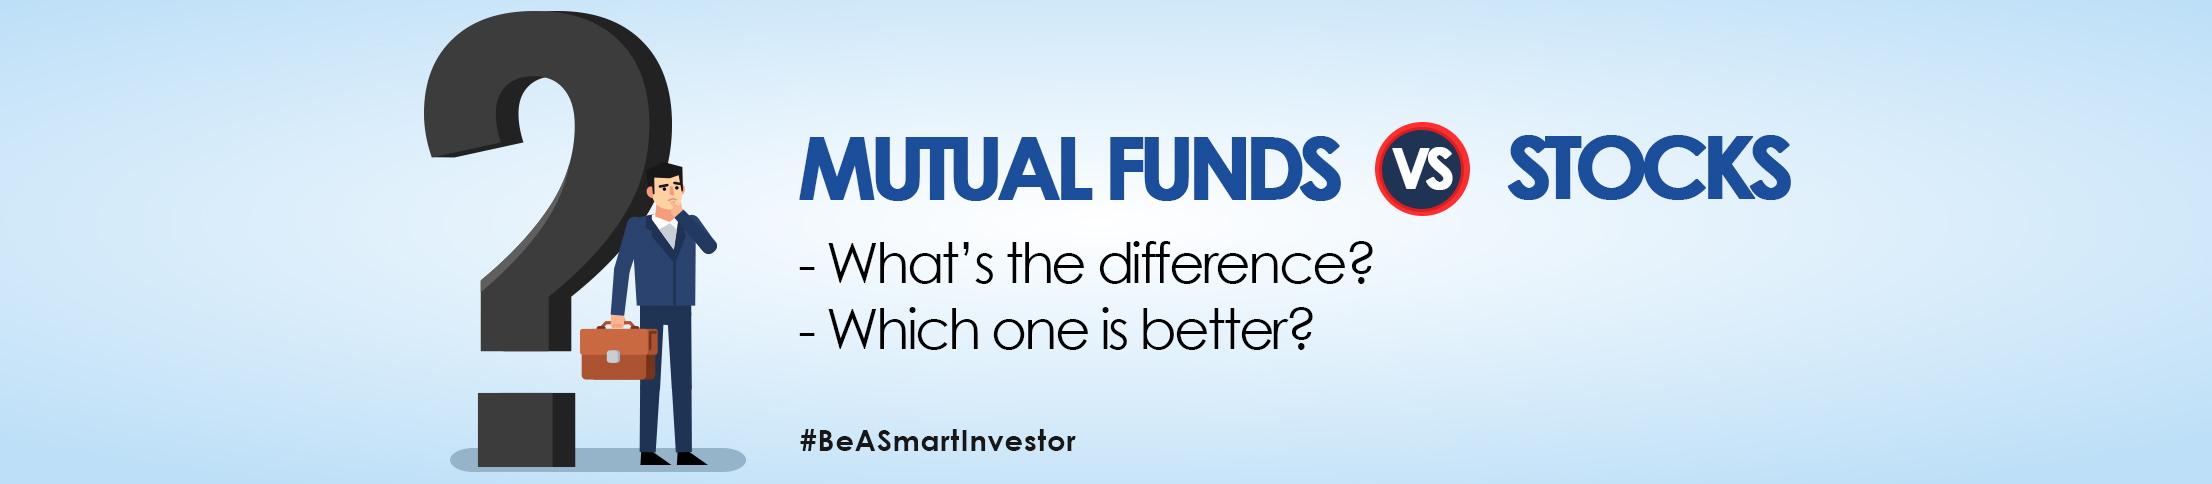 stock vs mutual funds